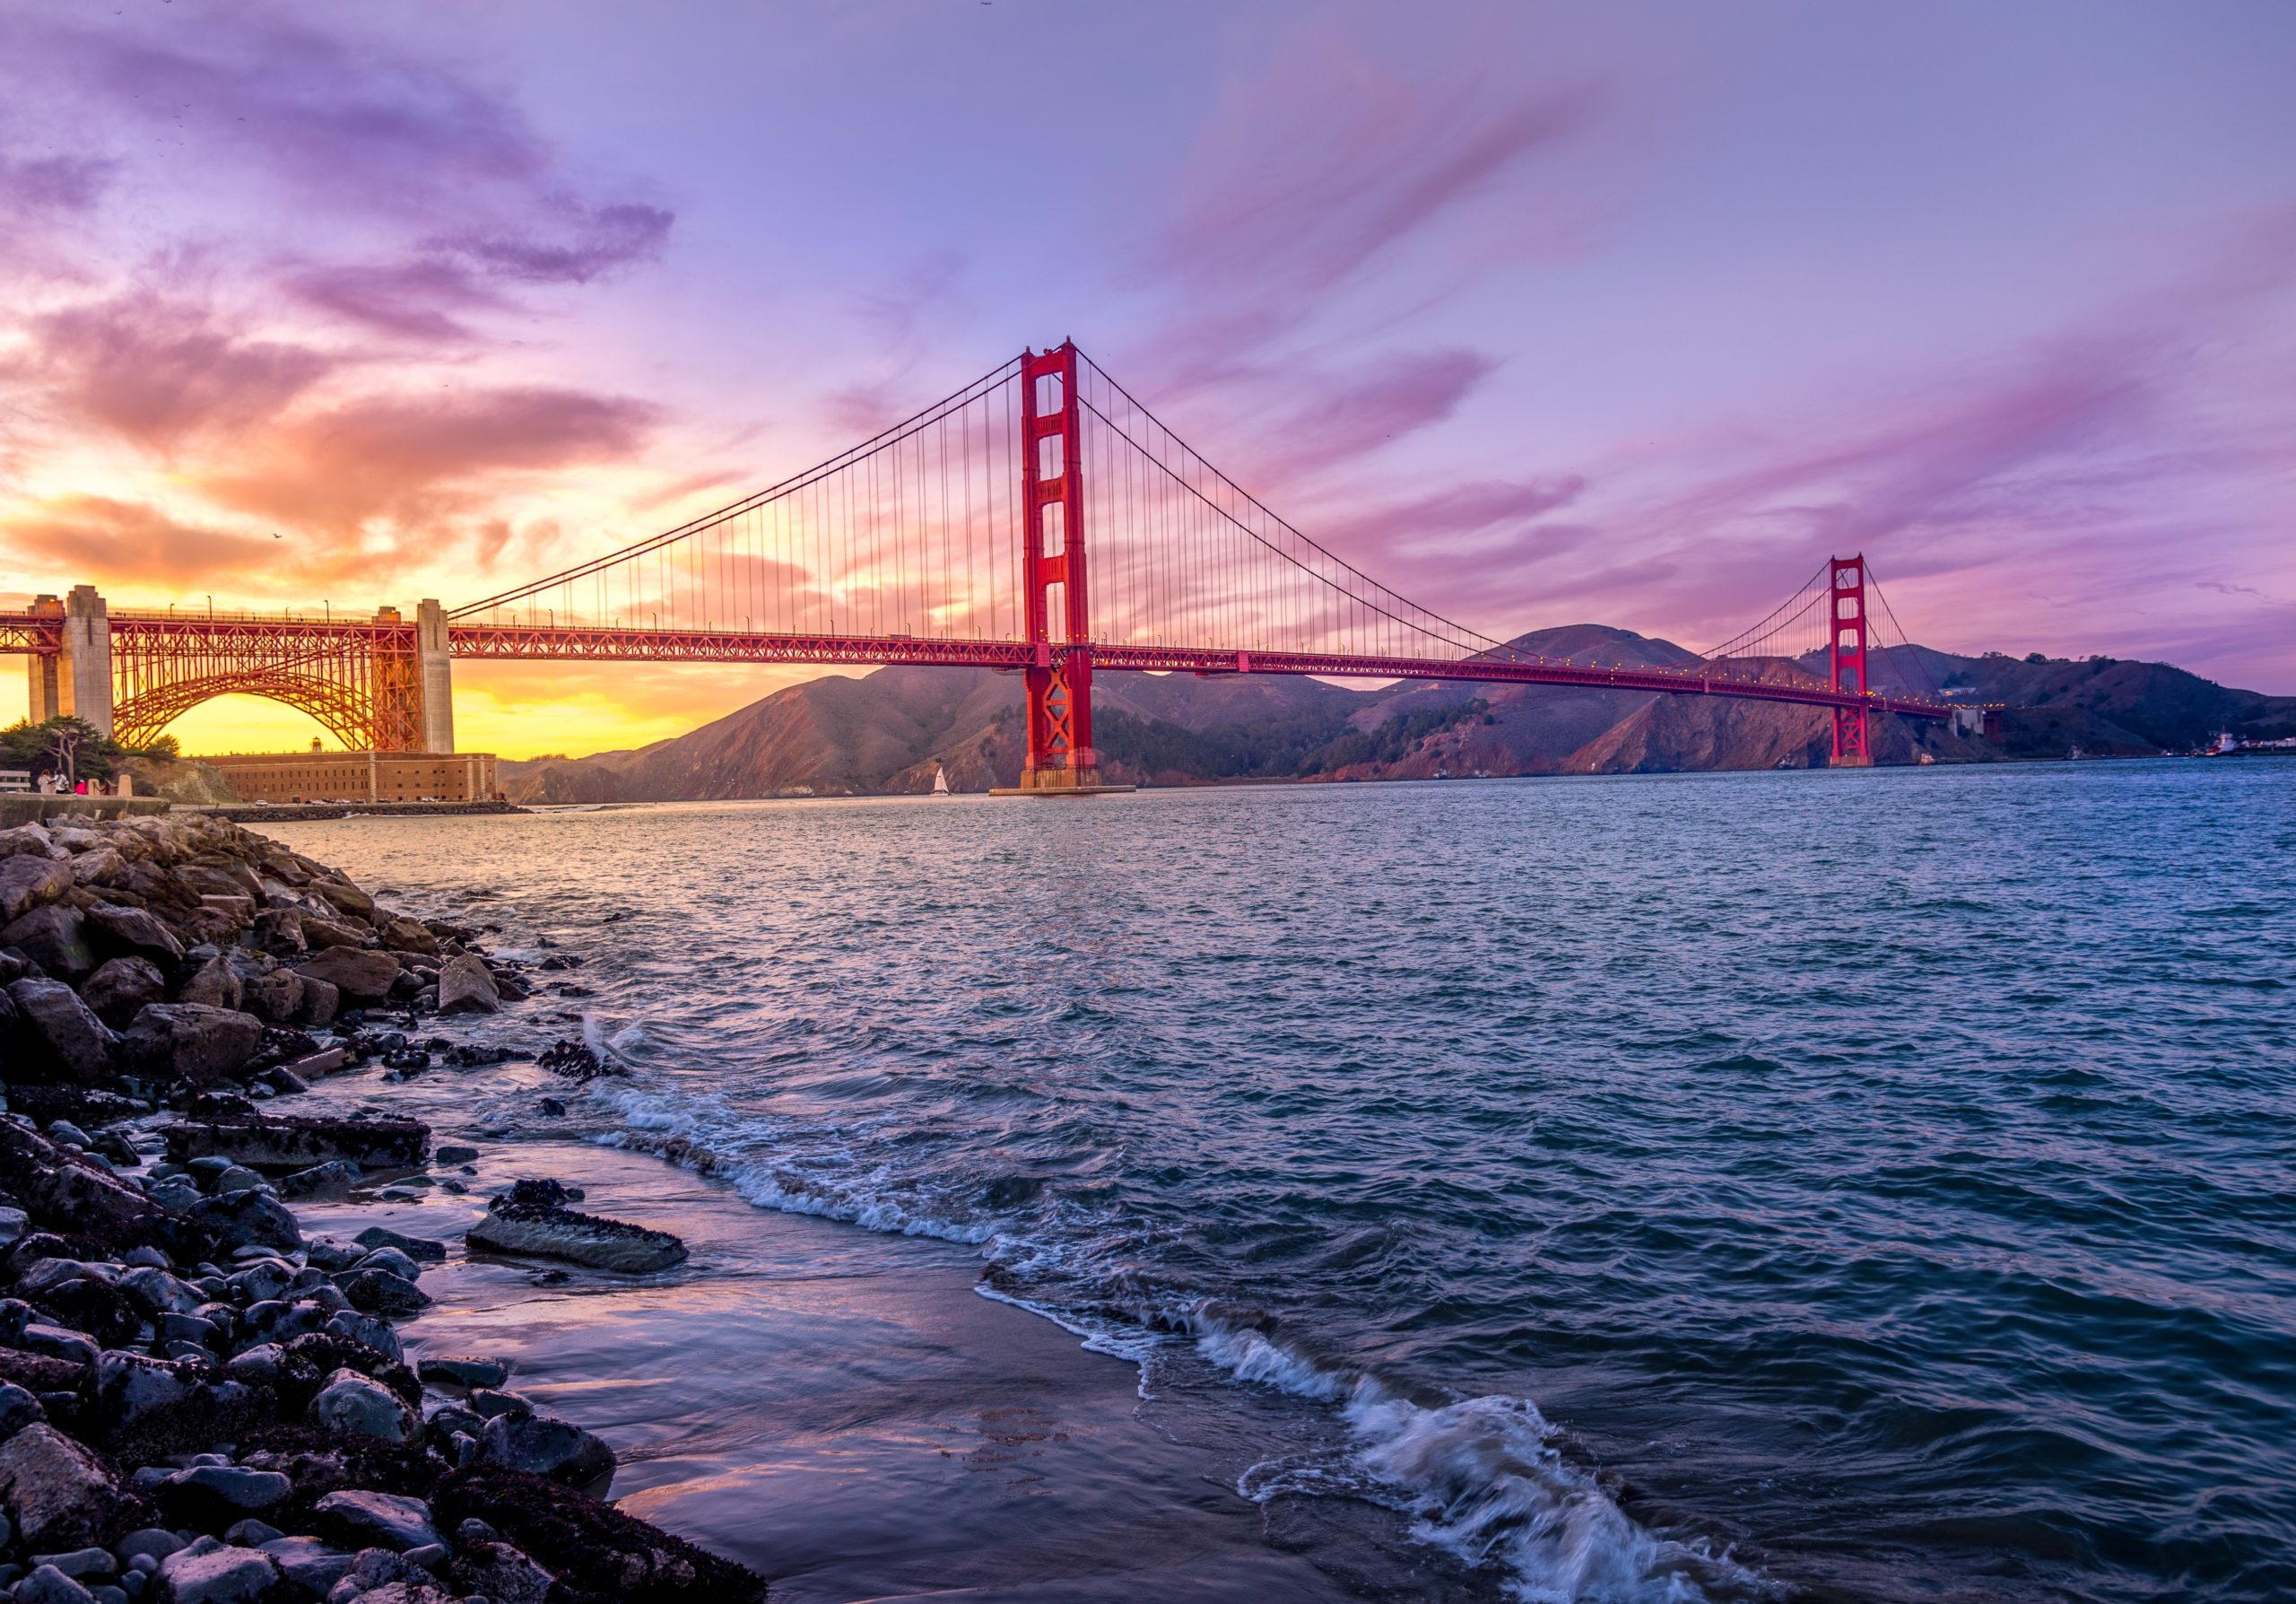 Mostovi nove Epohe